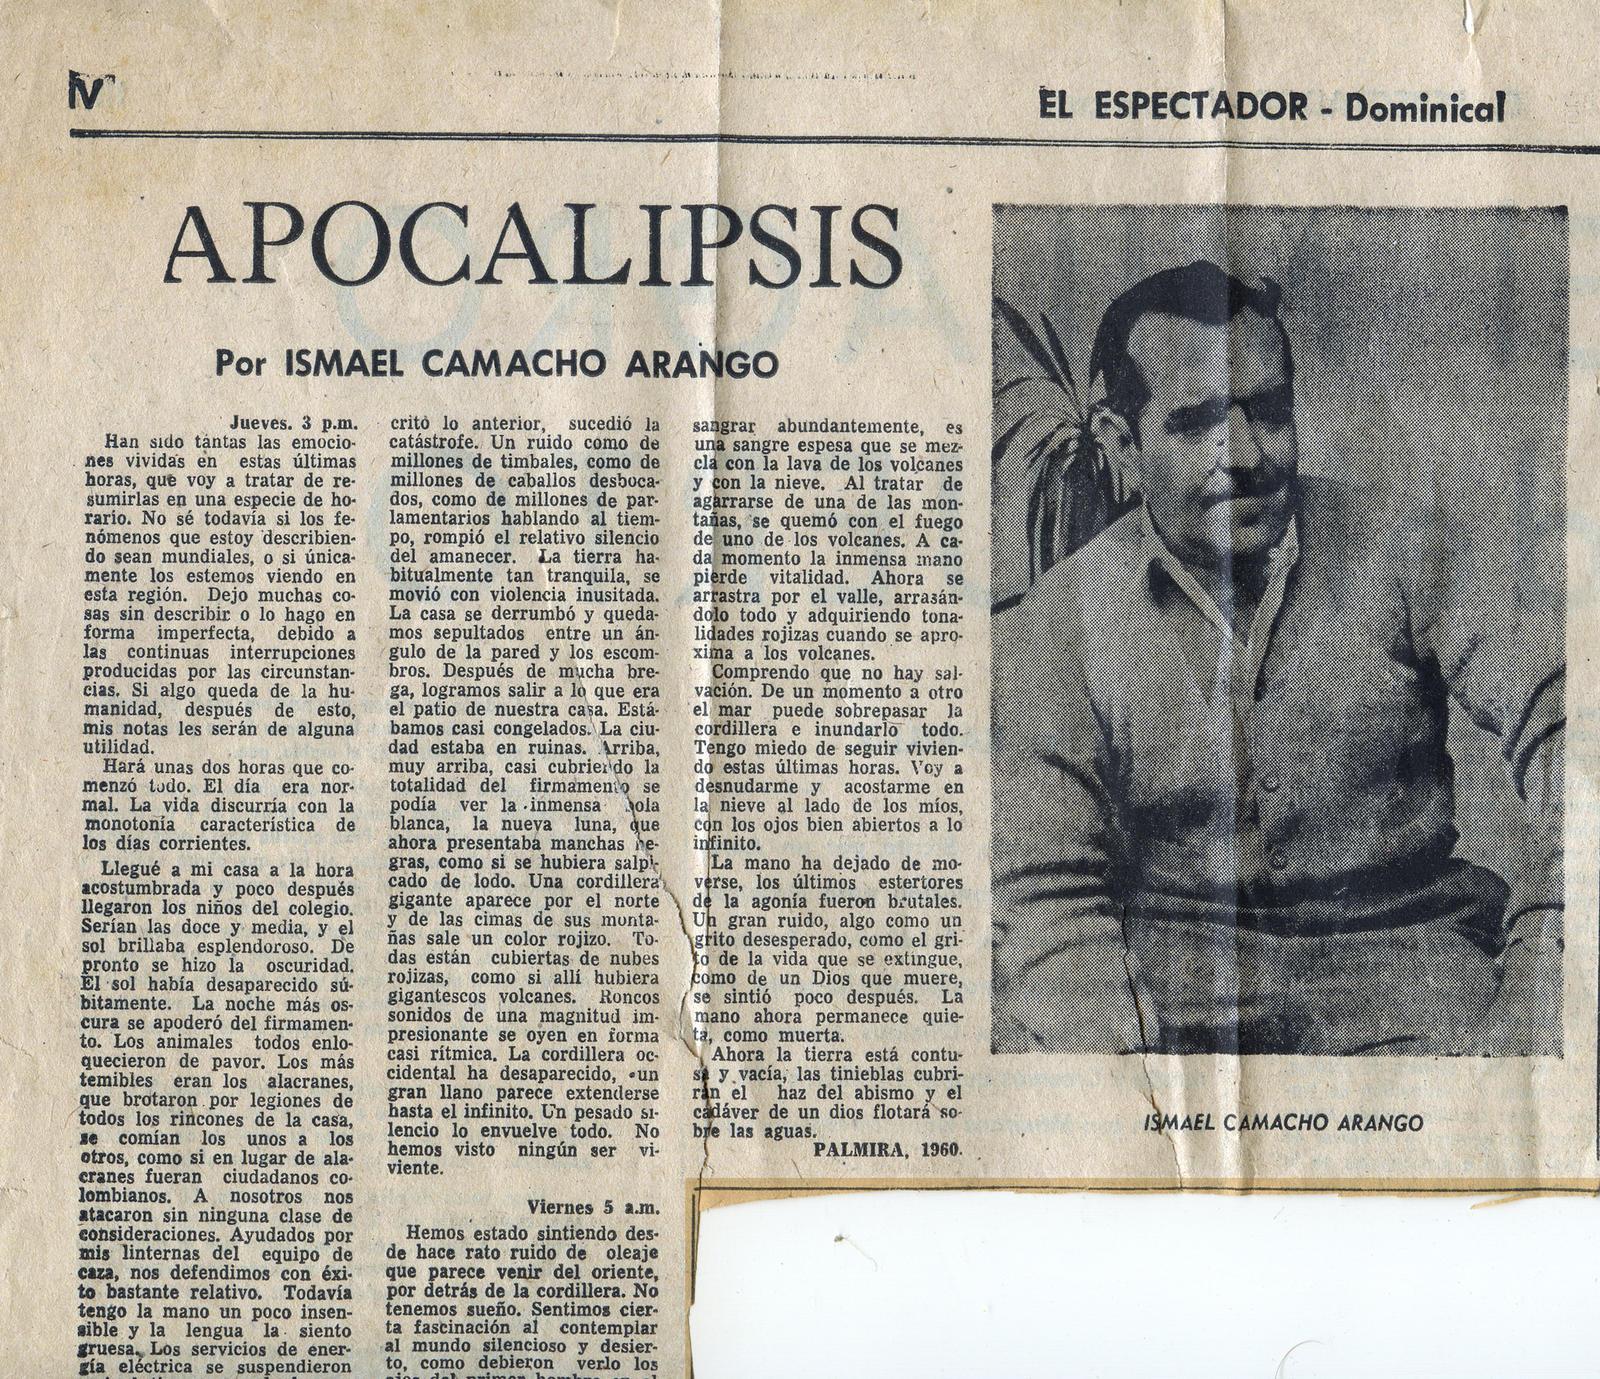 Apocalypses by Ismael Camacho Arango